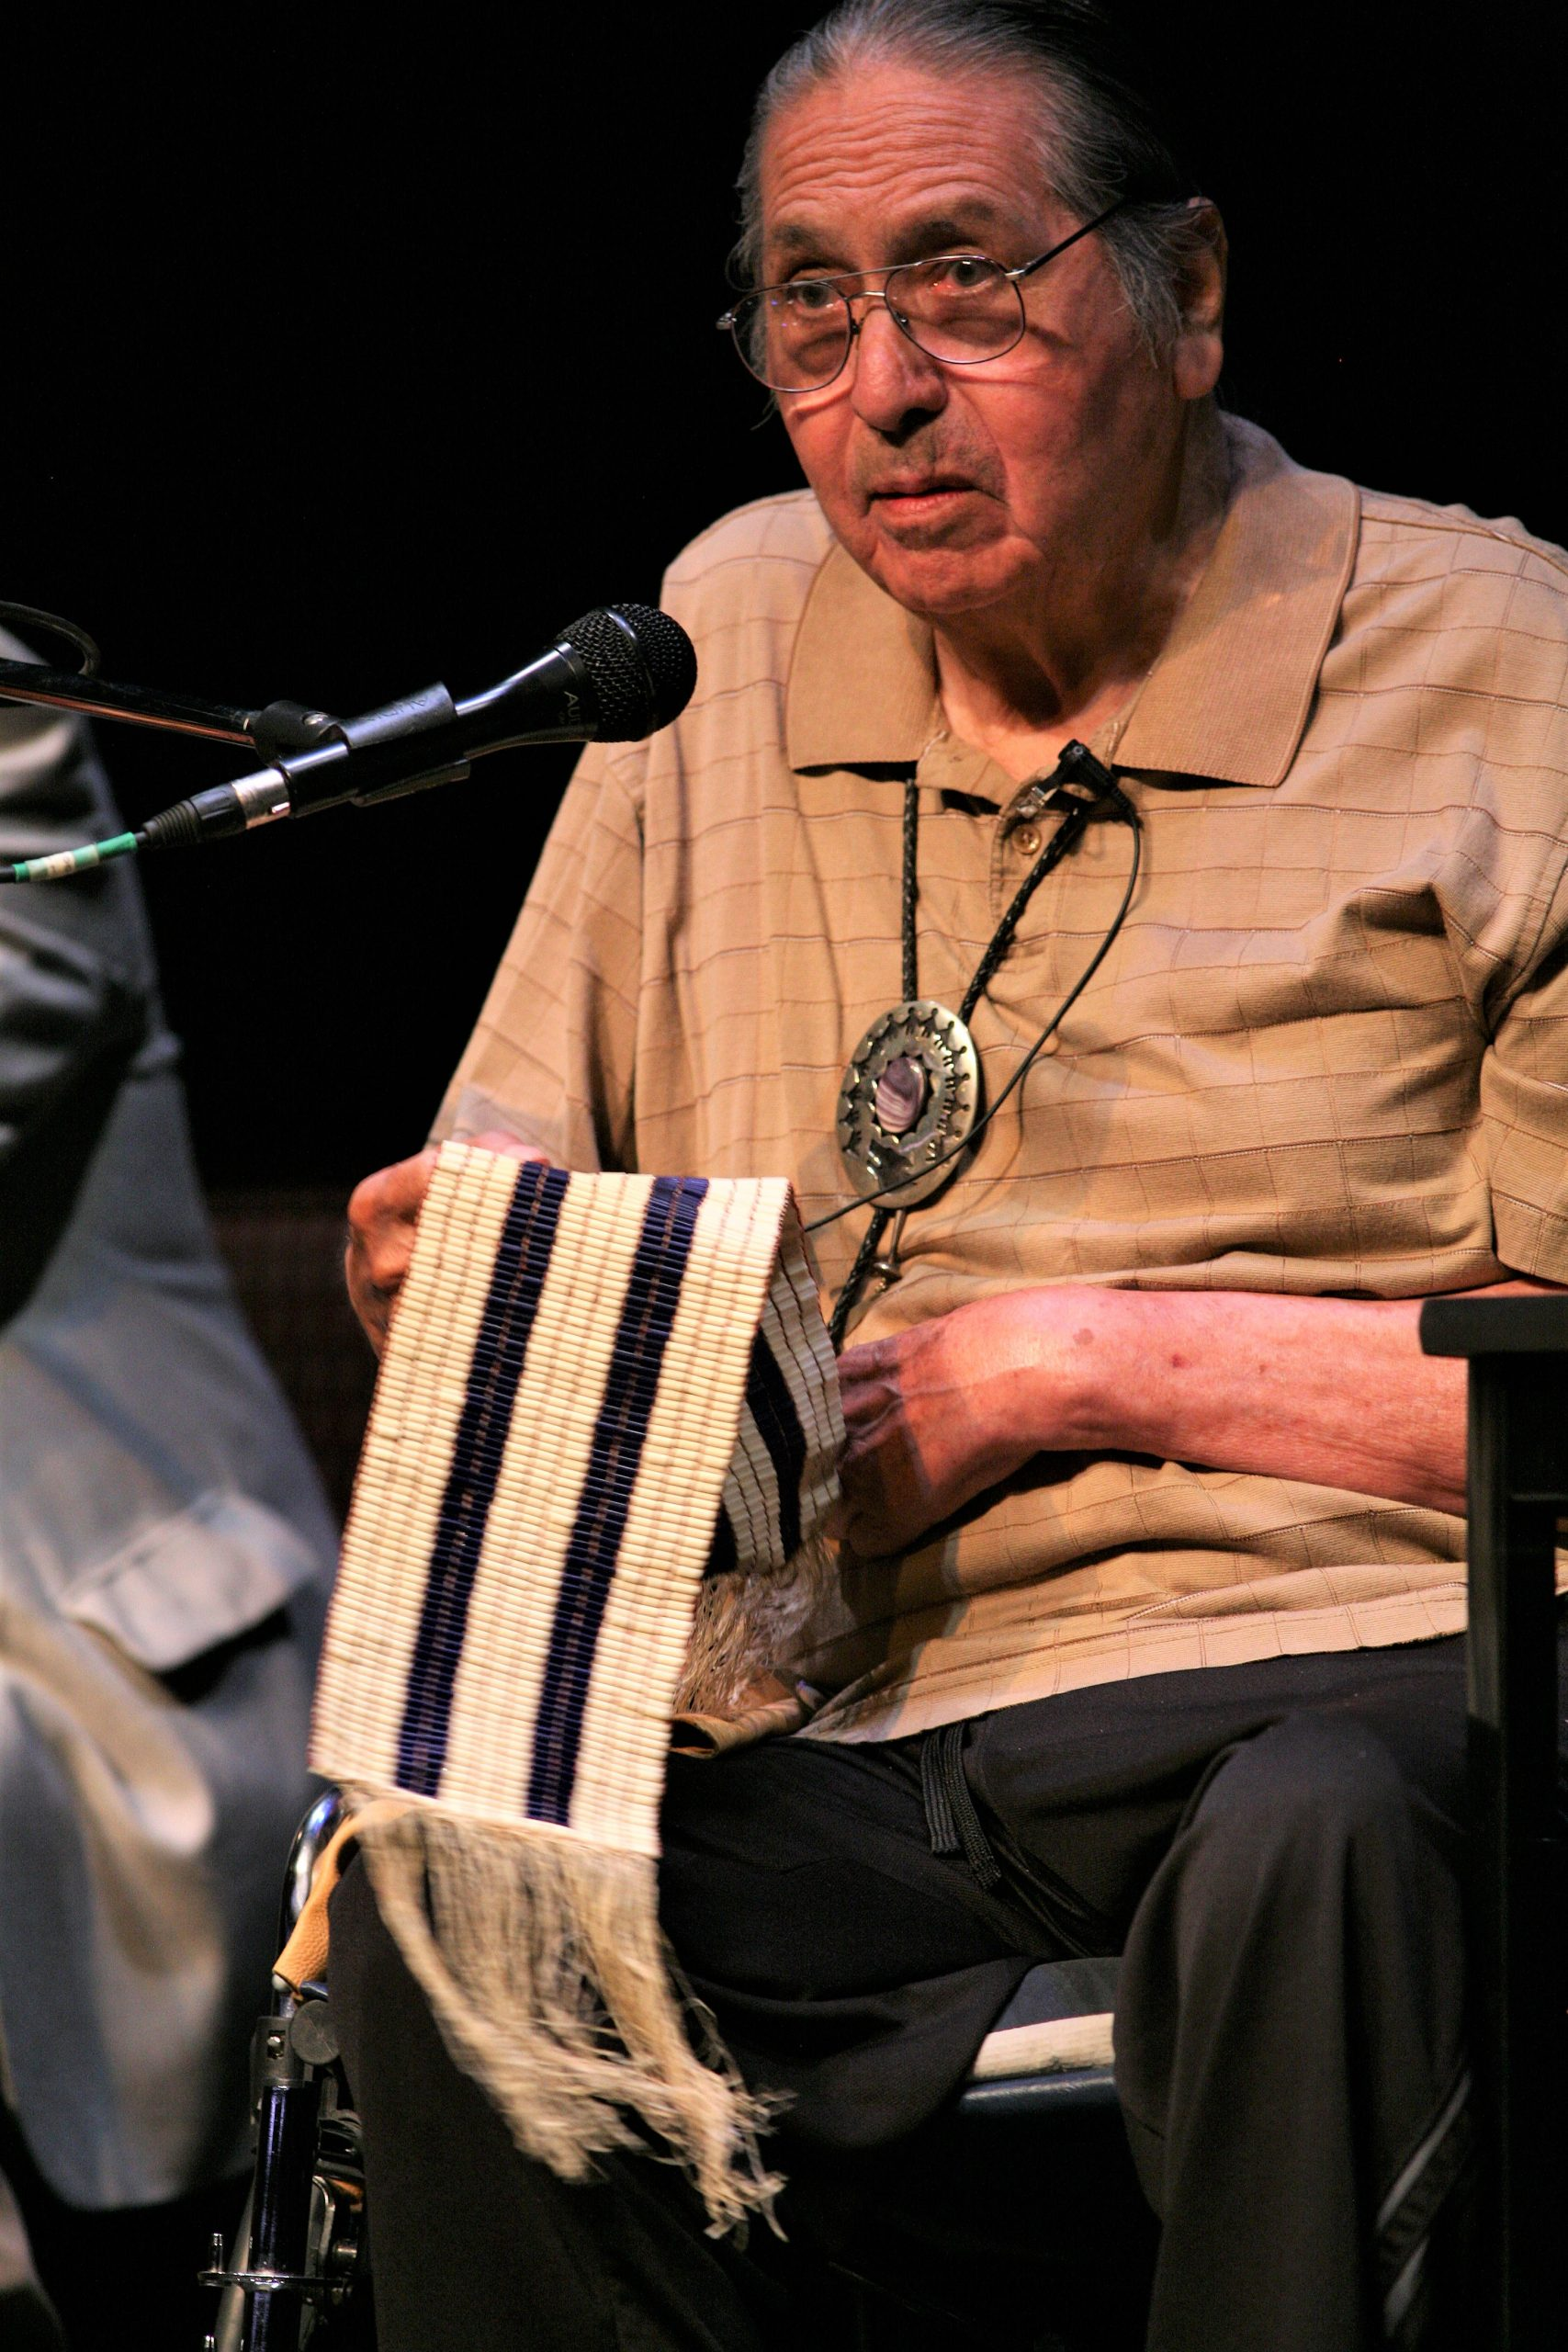 Onondaga Nation Chief Irving Powless Jr. displaying the two row wampum belt.